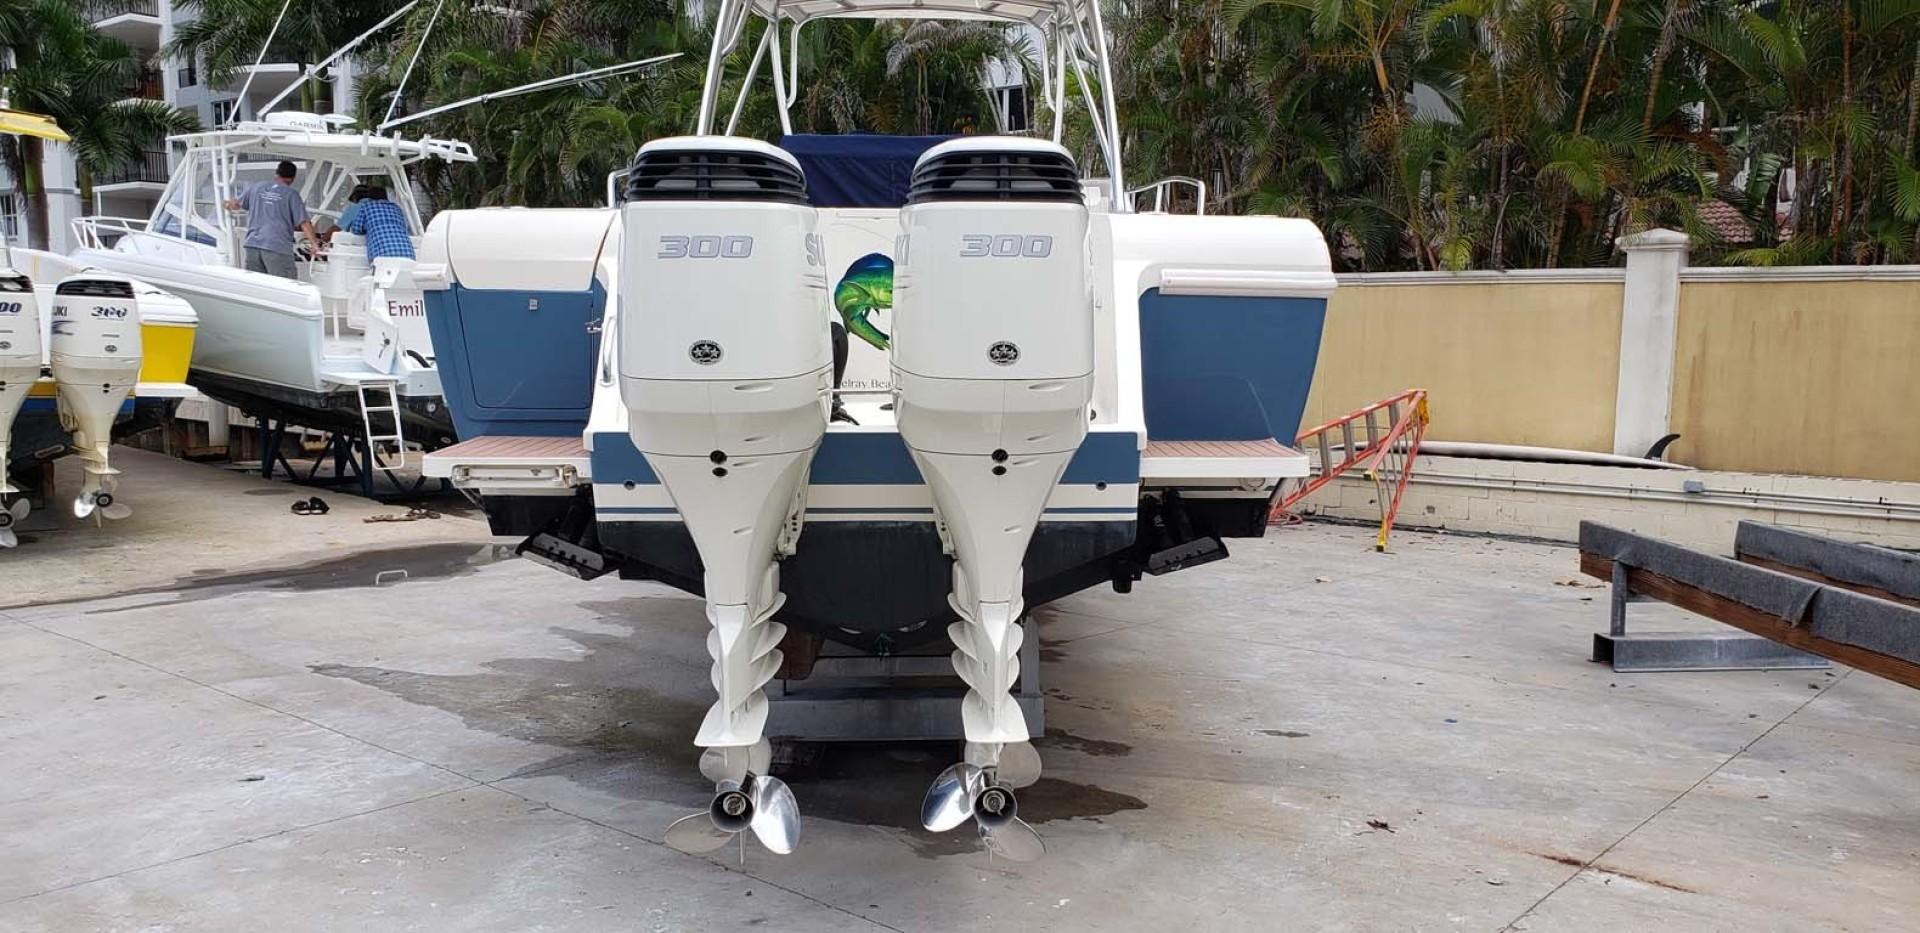 Intrepid-348 Walkaround 2003 -West Palm Beach-Florida-United States-1428856 | Thumbnail